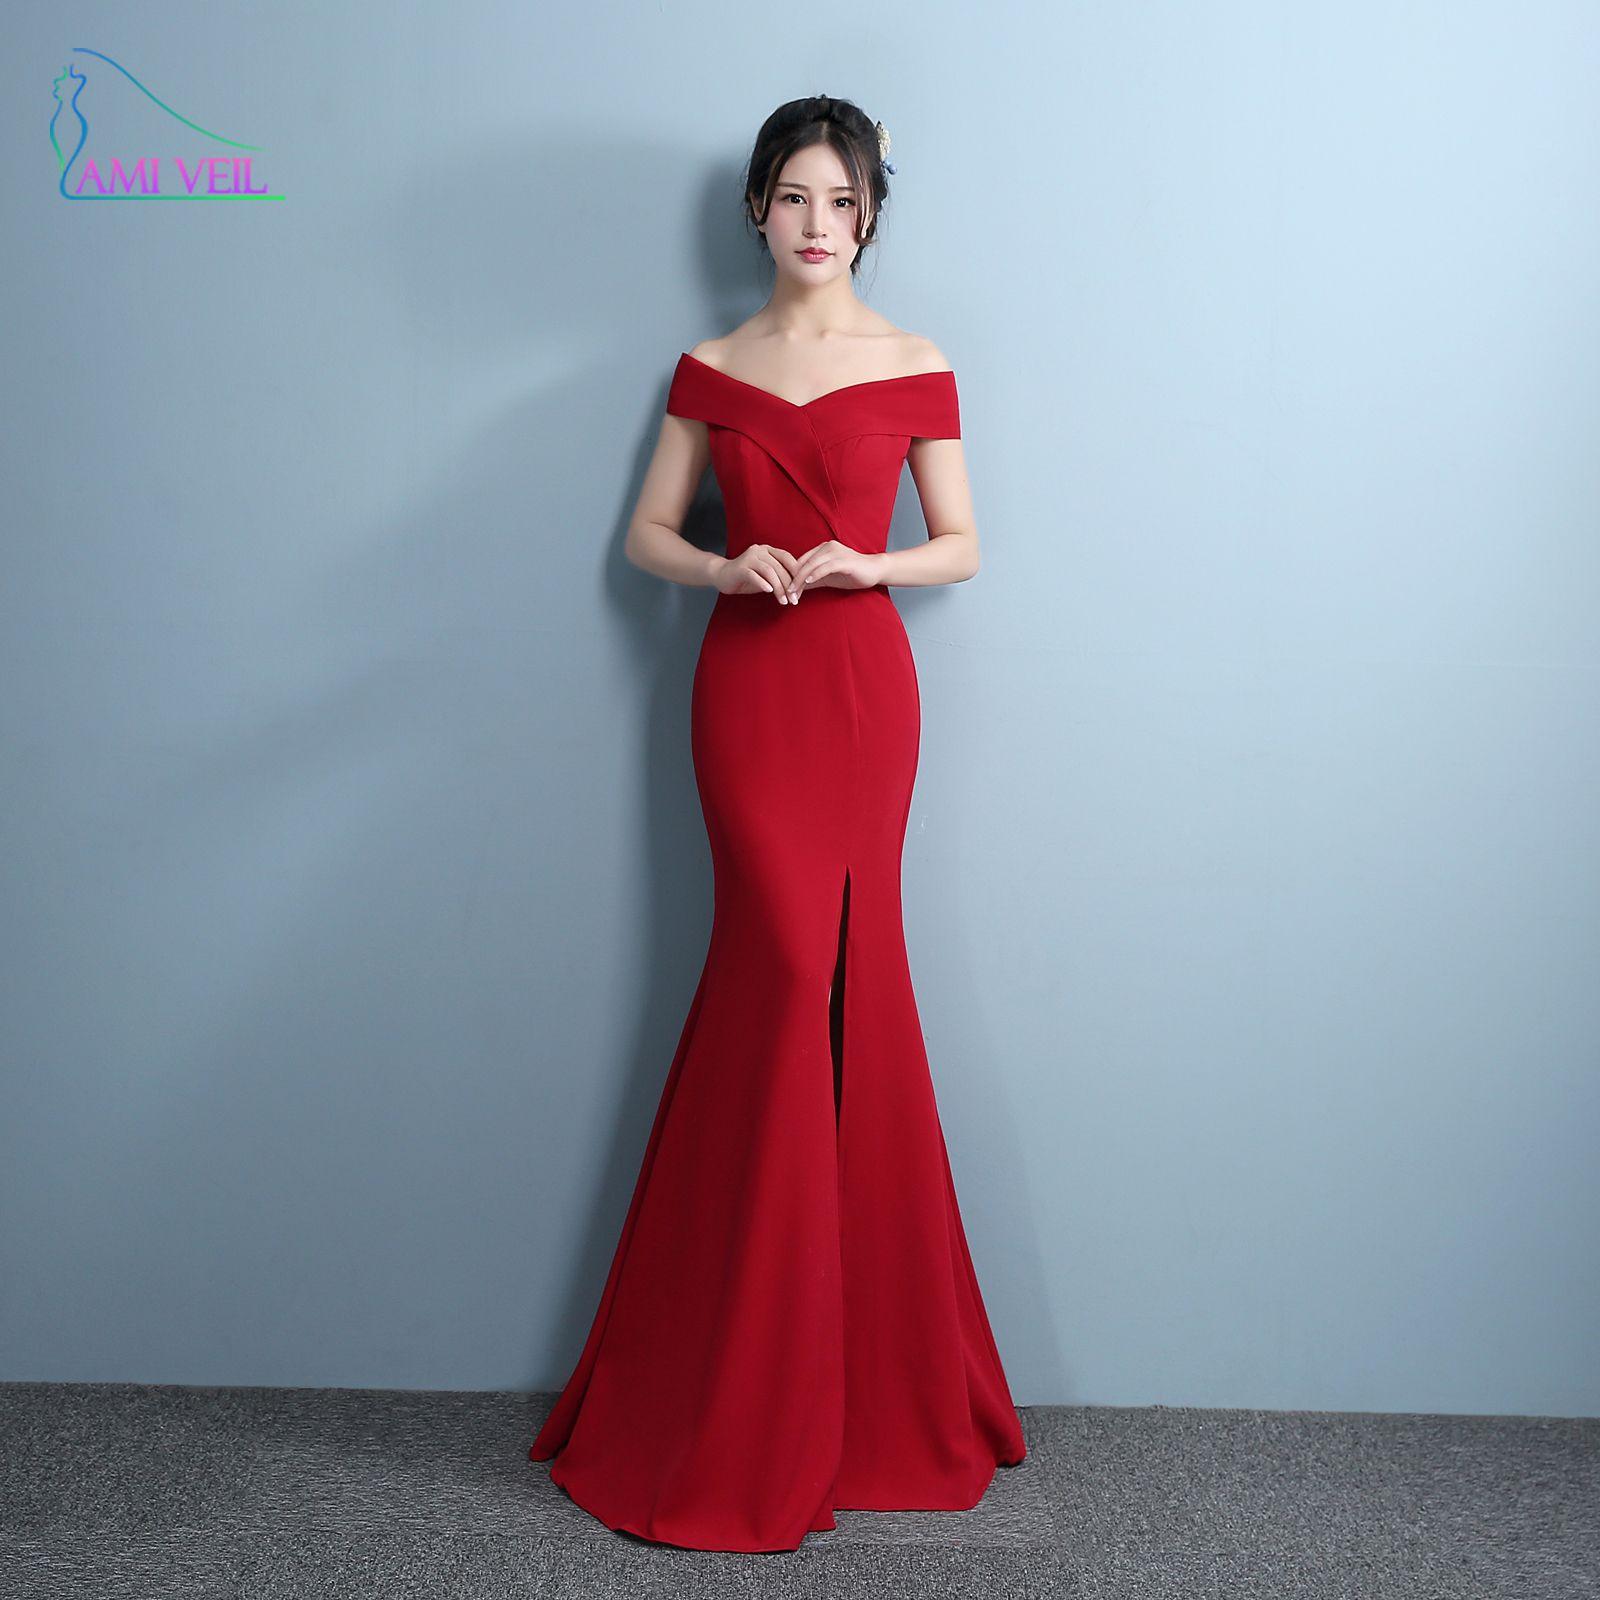 Mermaid Designer Evening Gowns Side Split Red Prom Dress Sexy Long Evening Dresses V Neck Imported Party Vestidos De Gala GQ827